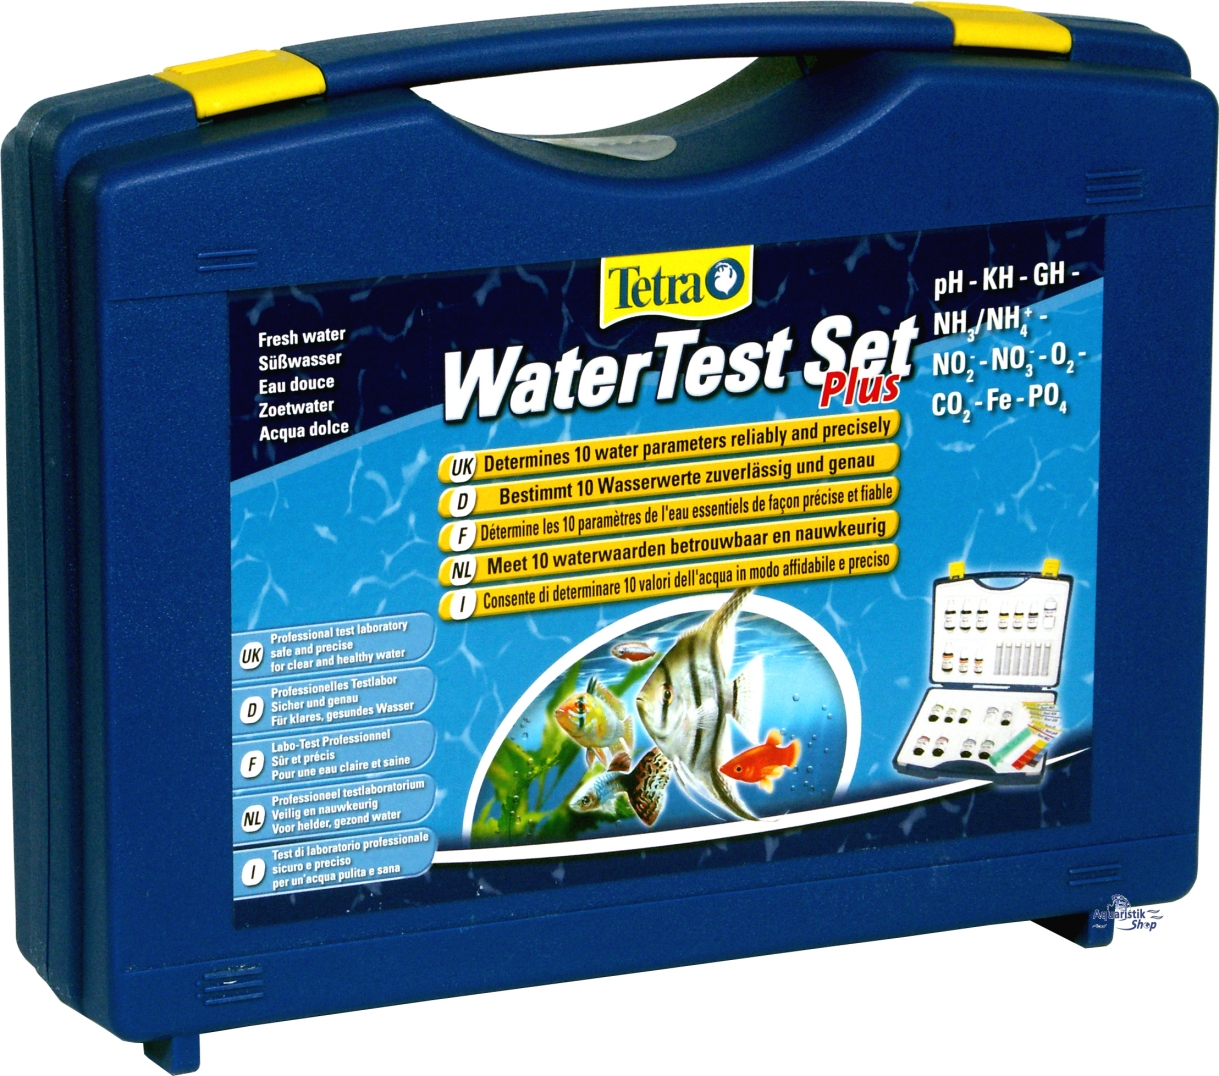 Water test set